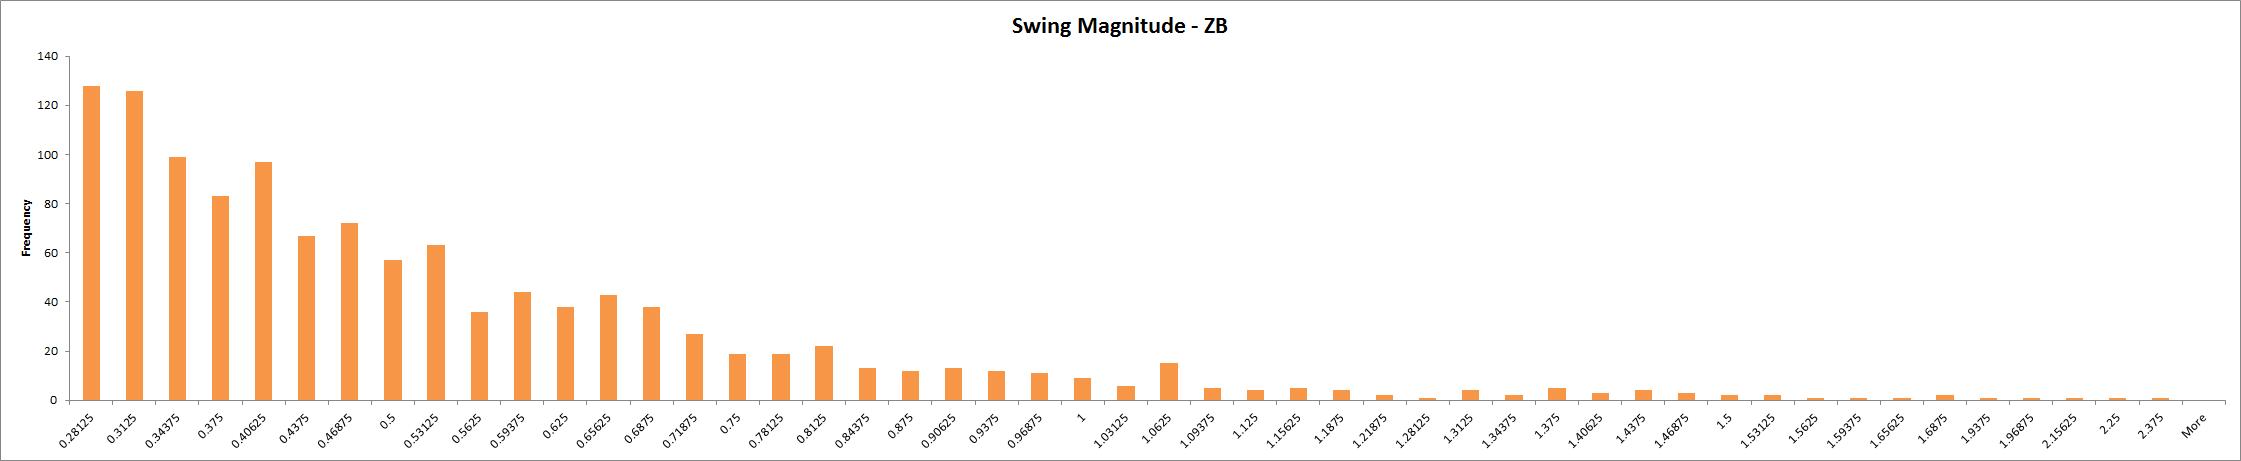 Swing Magnitude - ZB